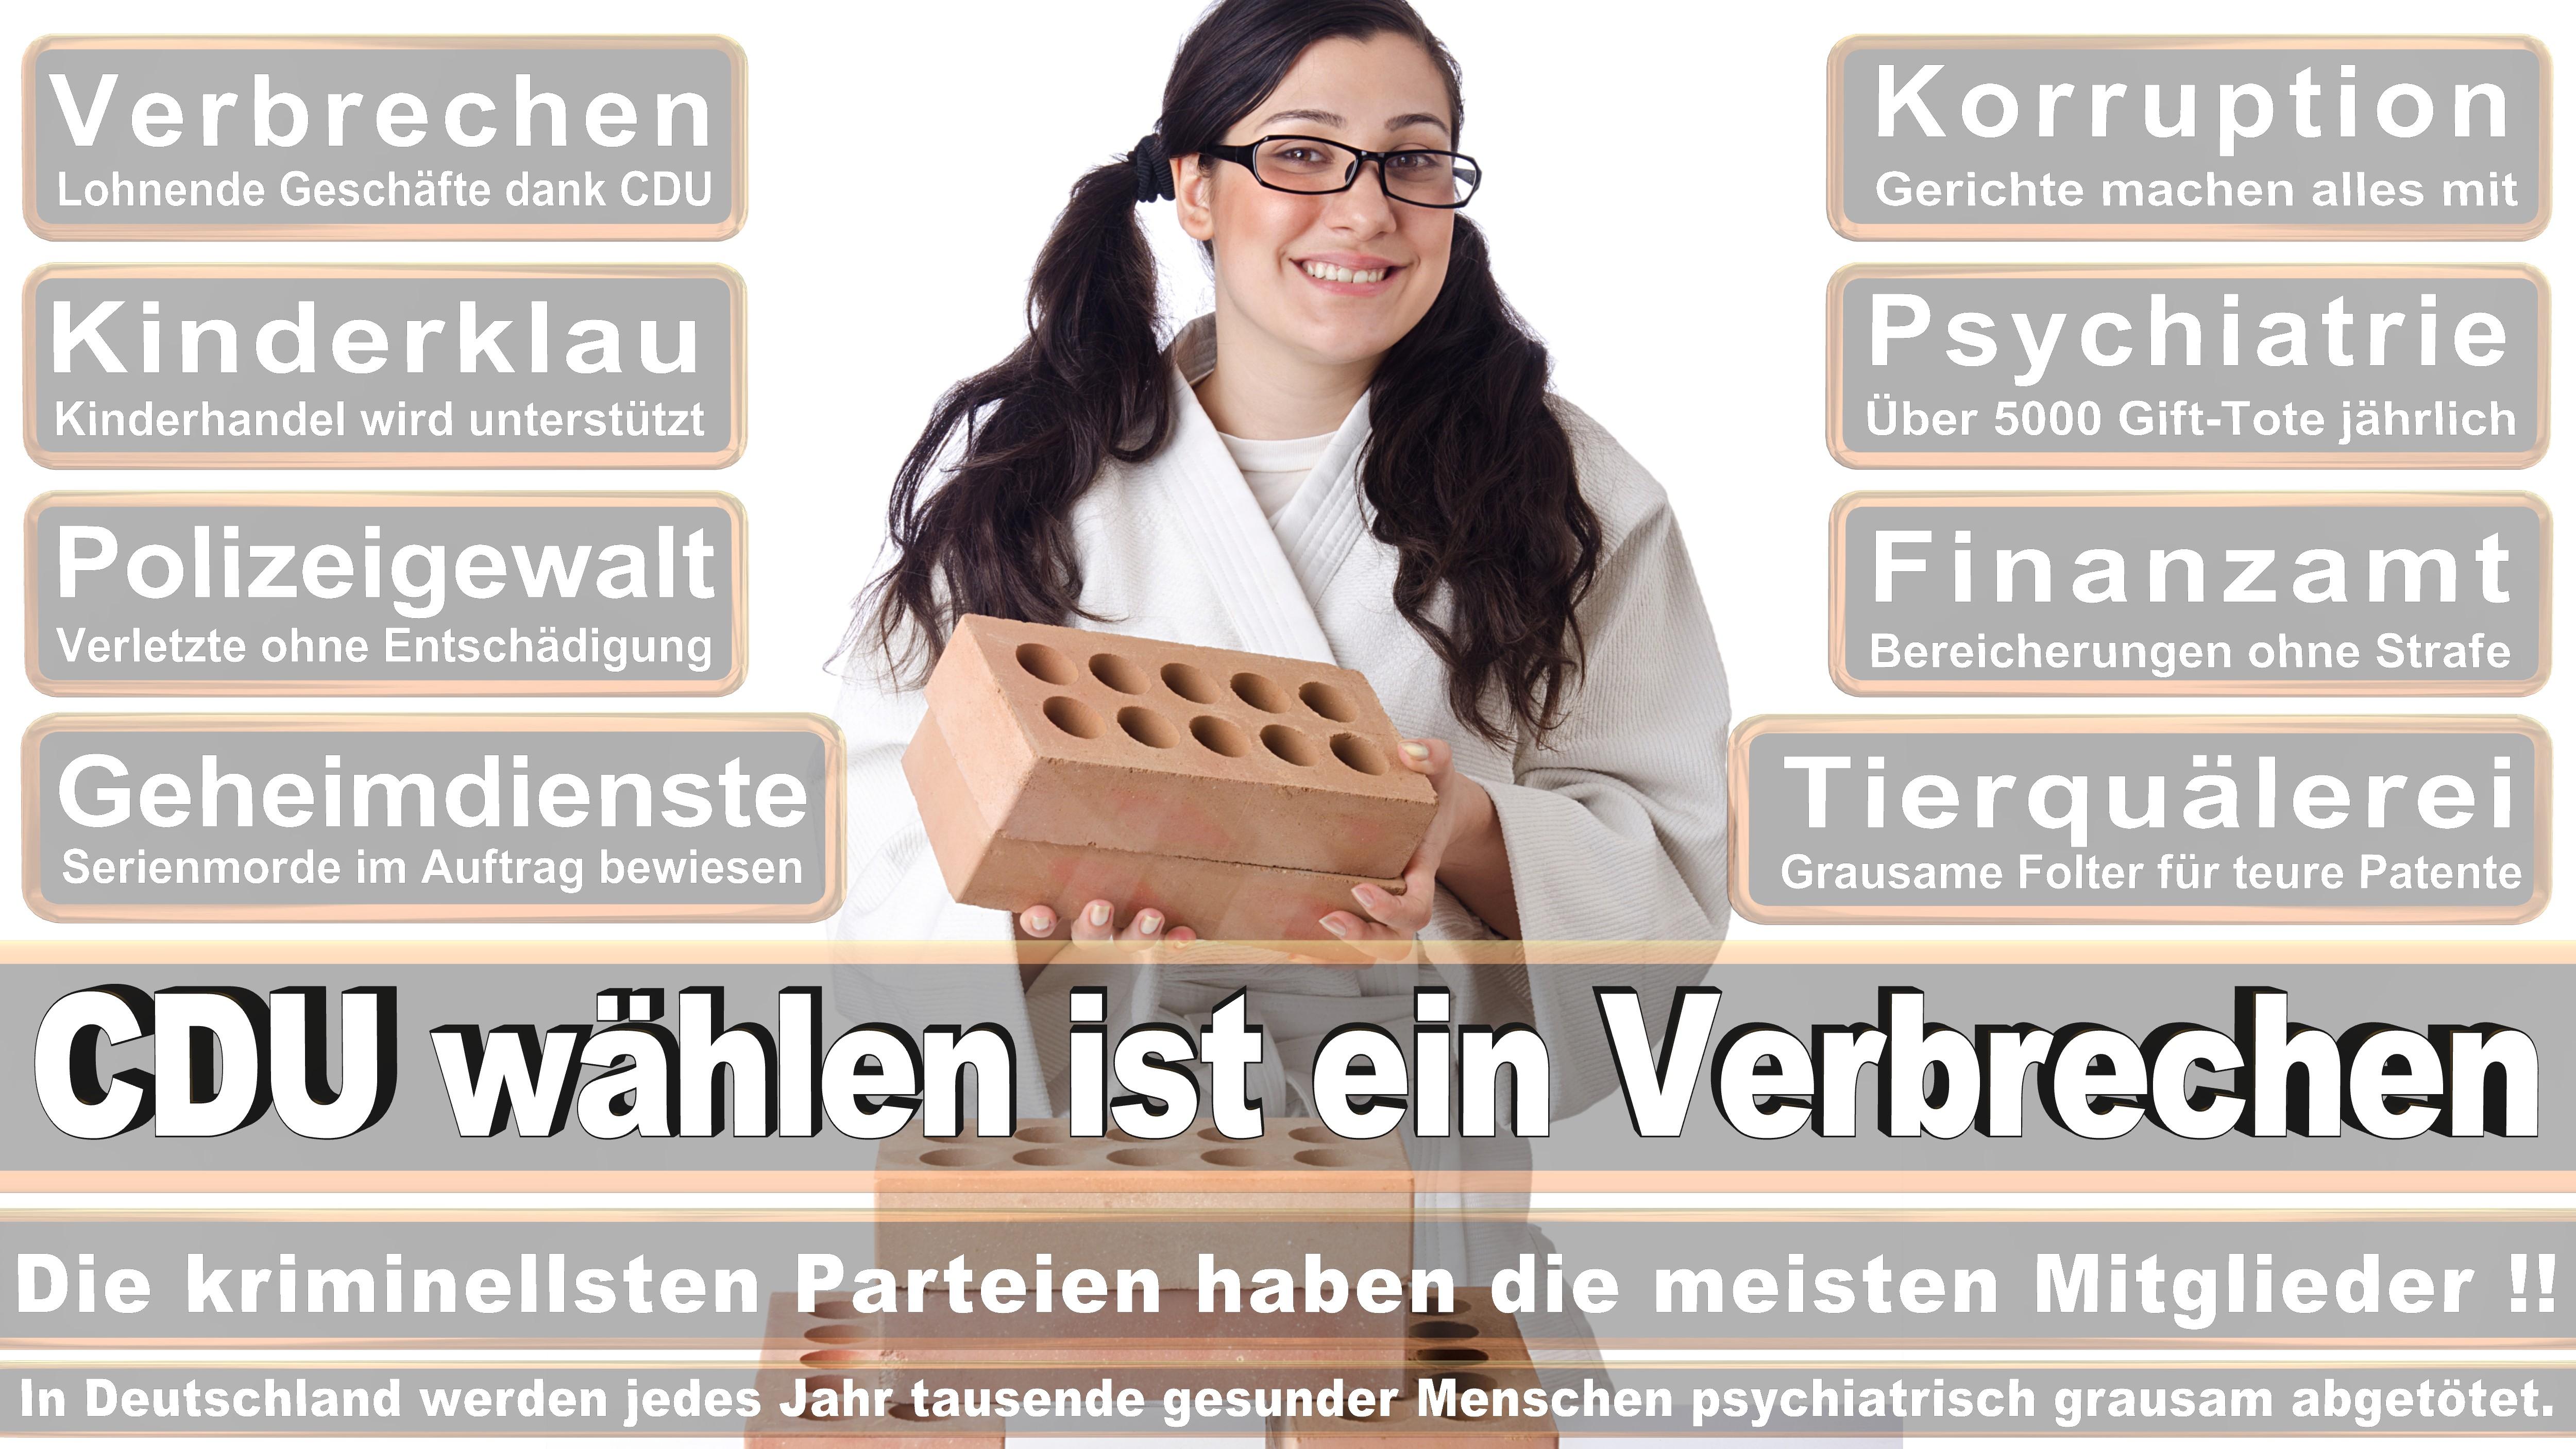 Hermann Färber CDU CSU Politiker